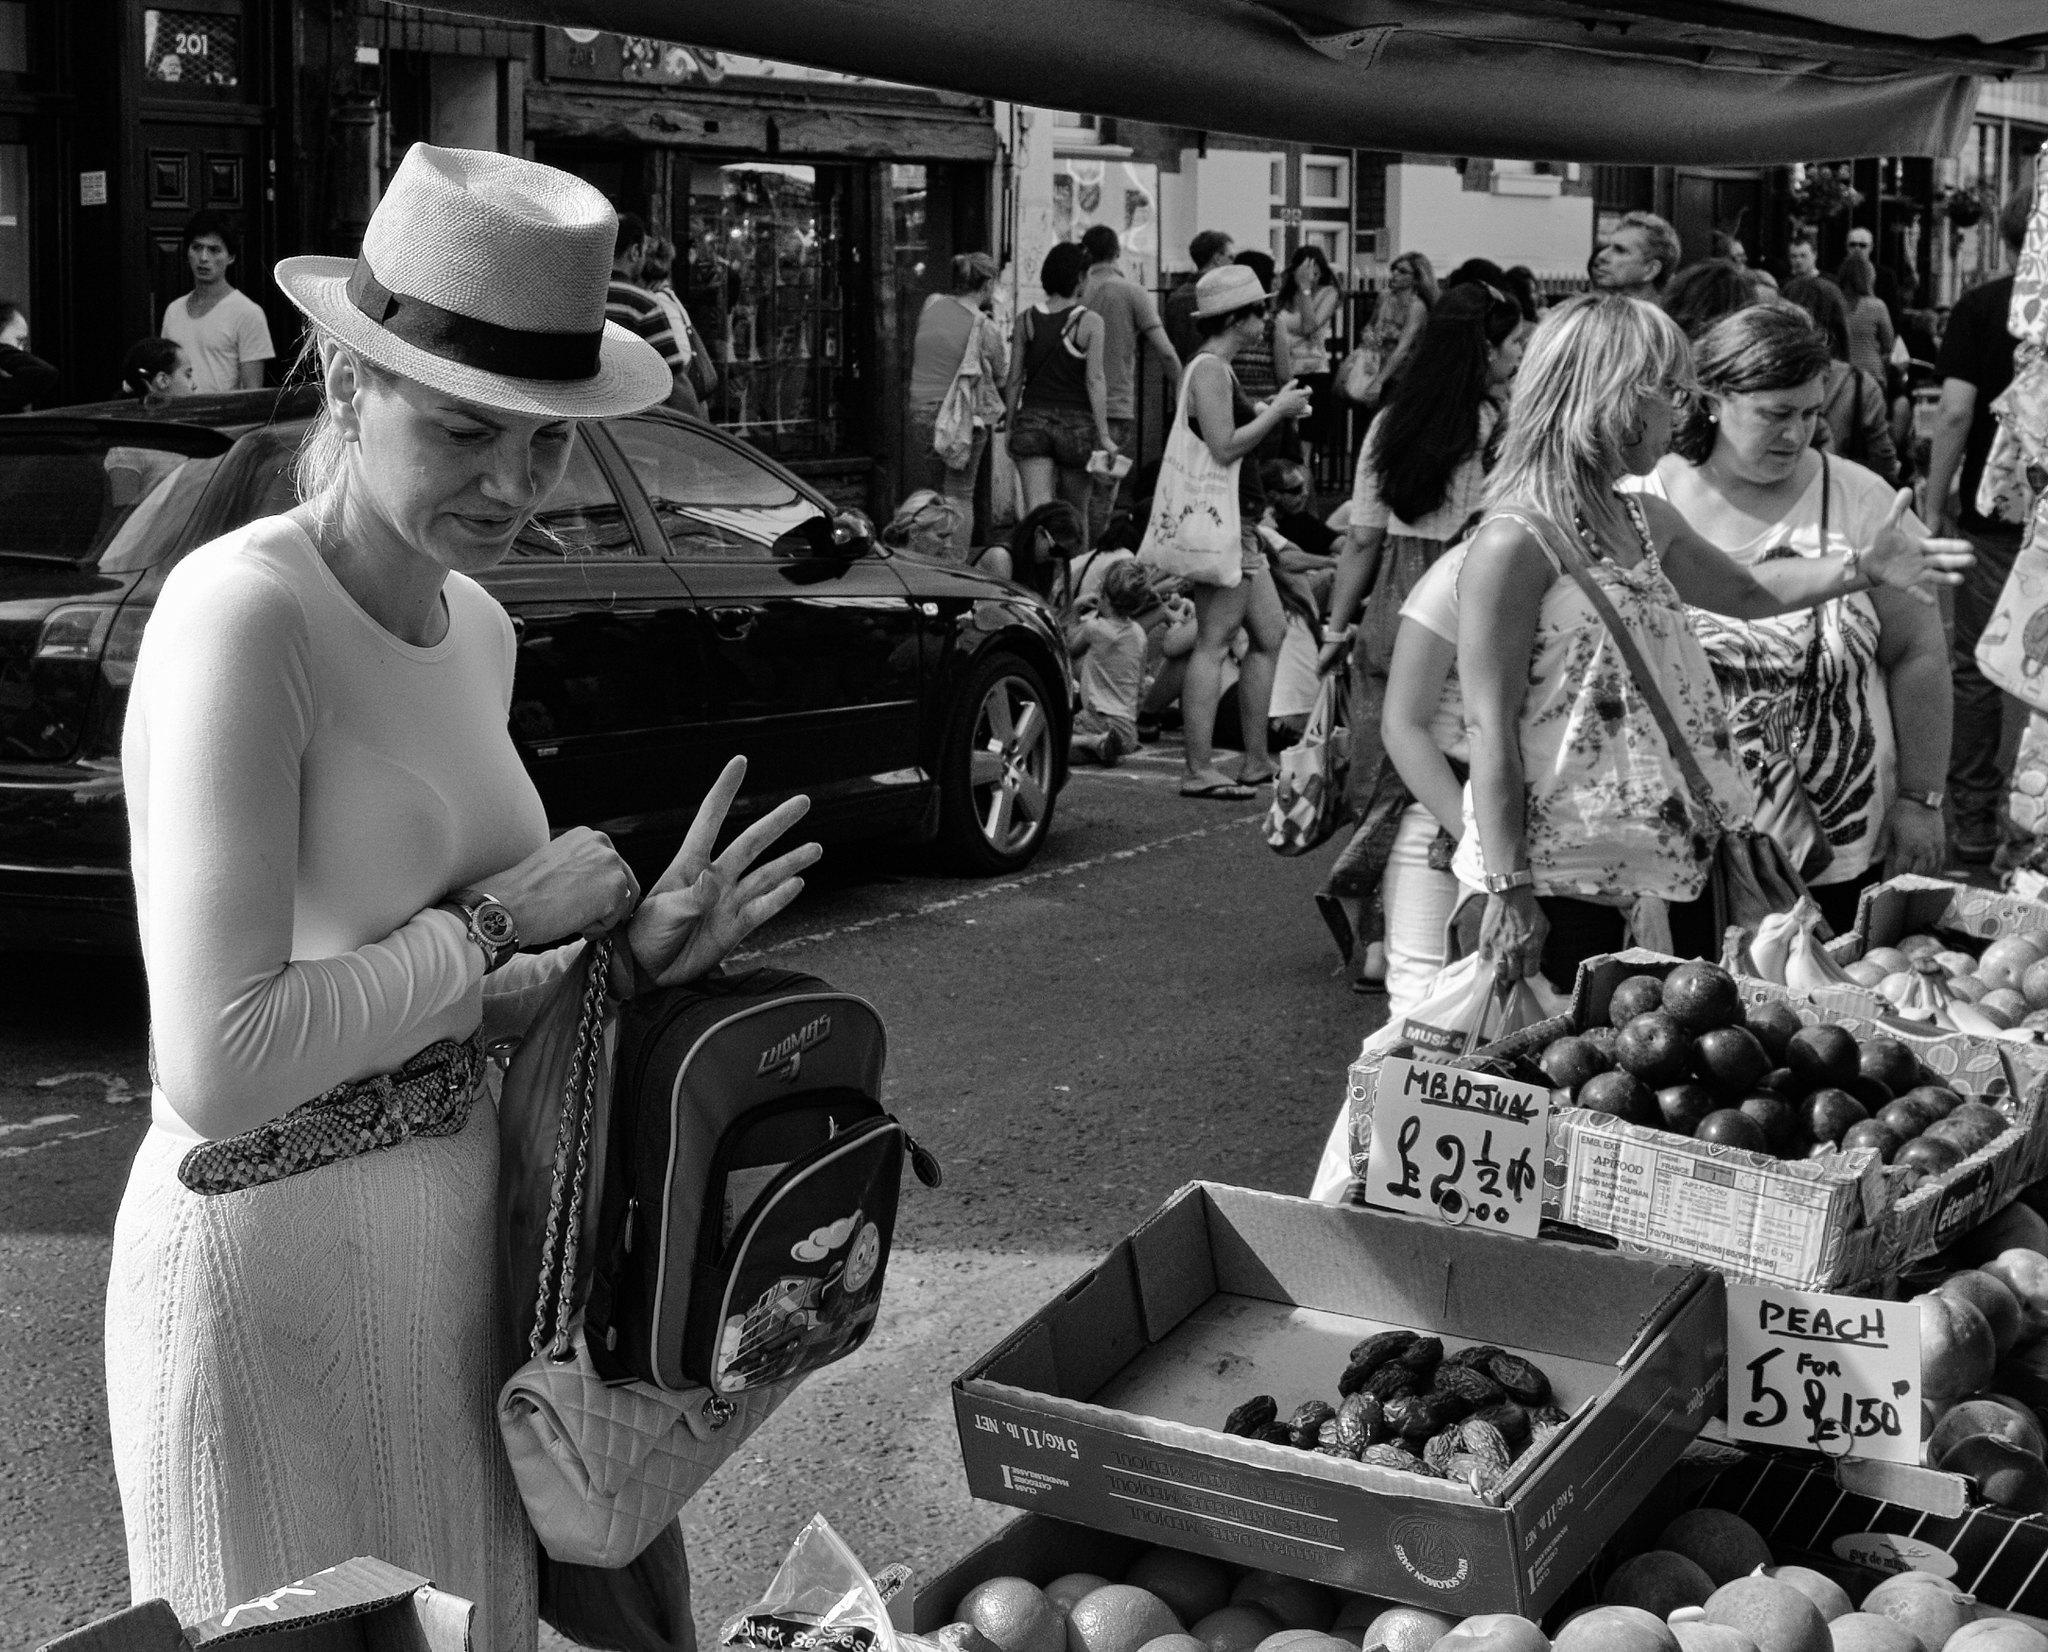 Portobello market 2011